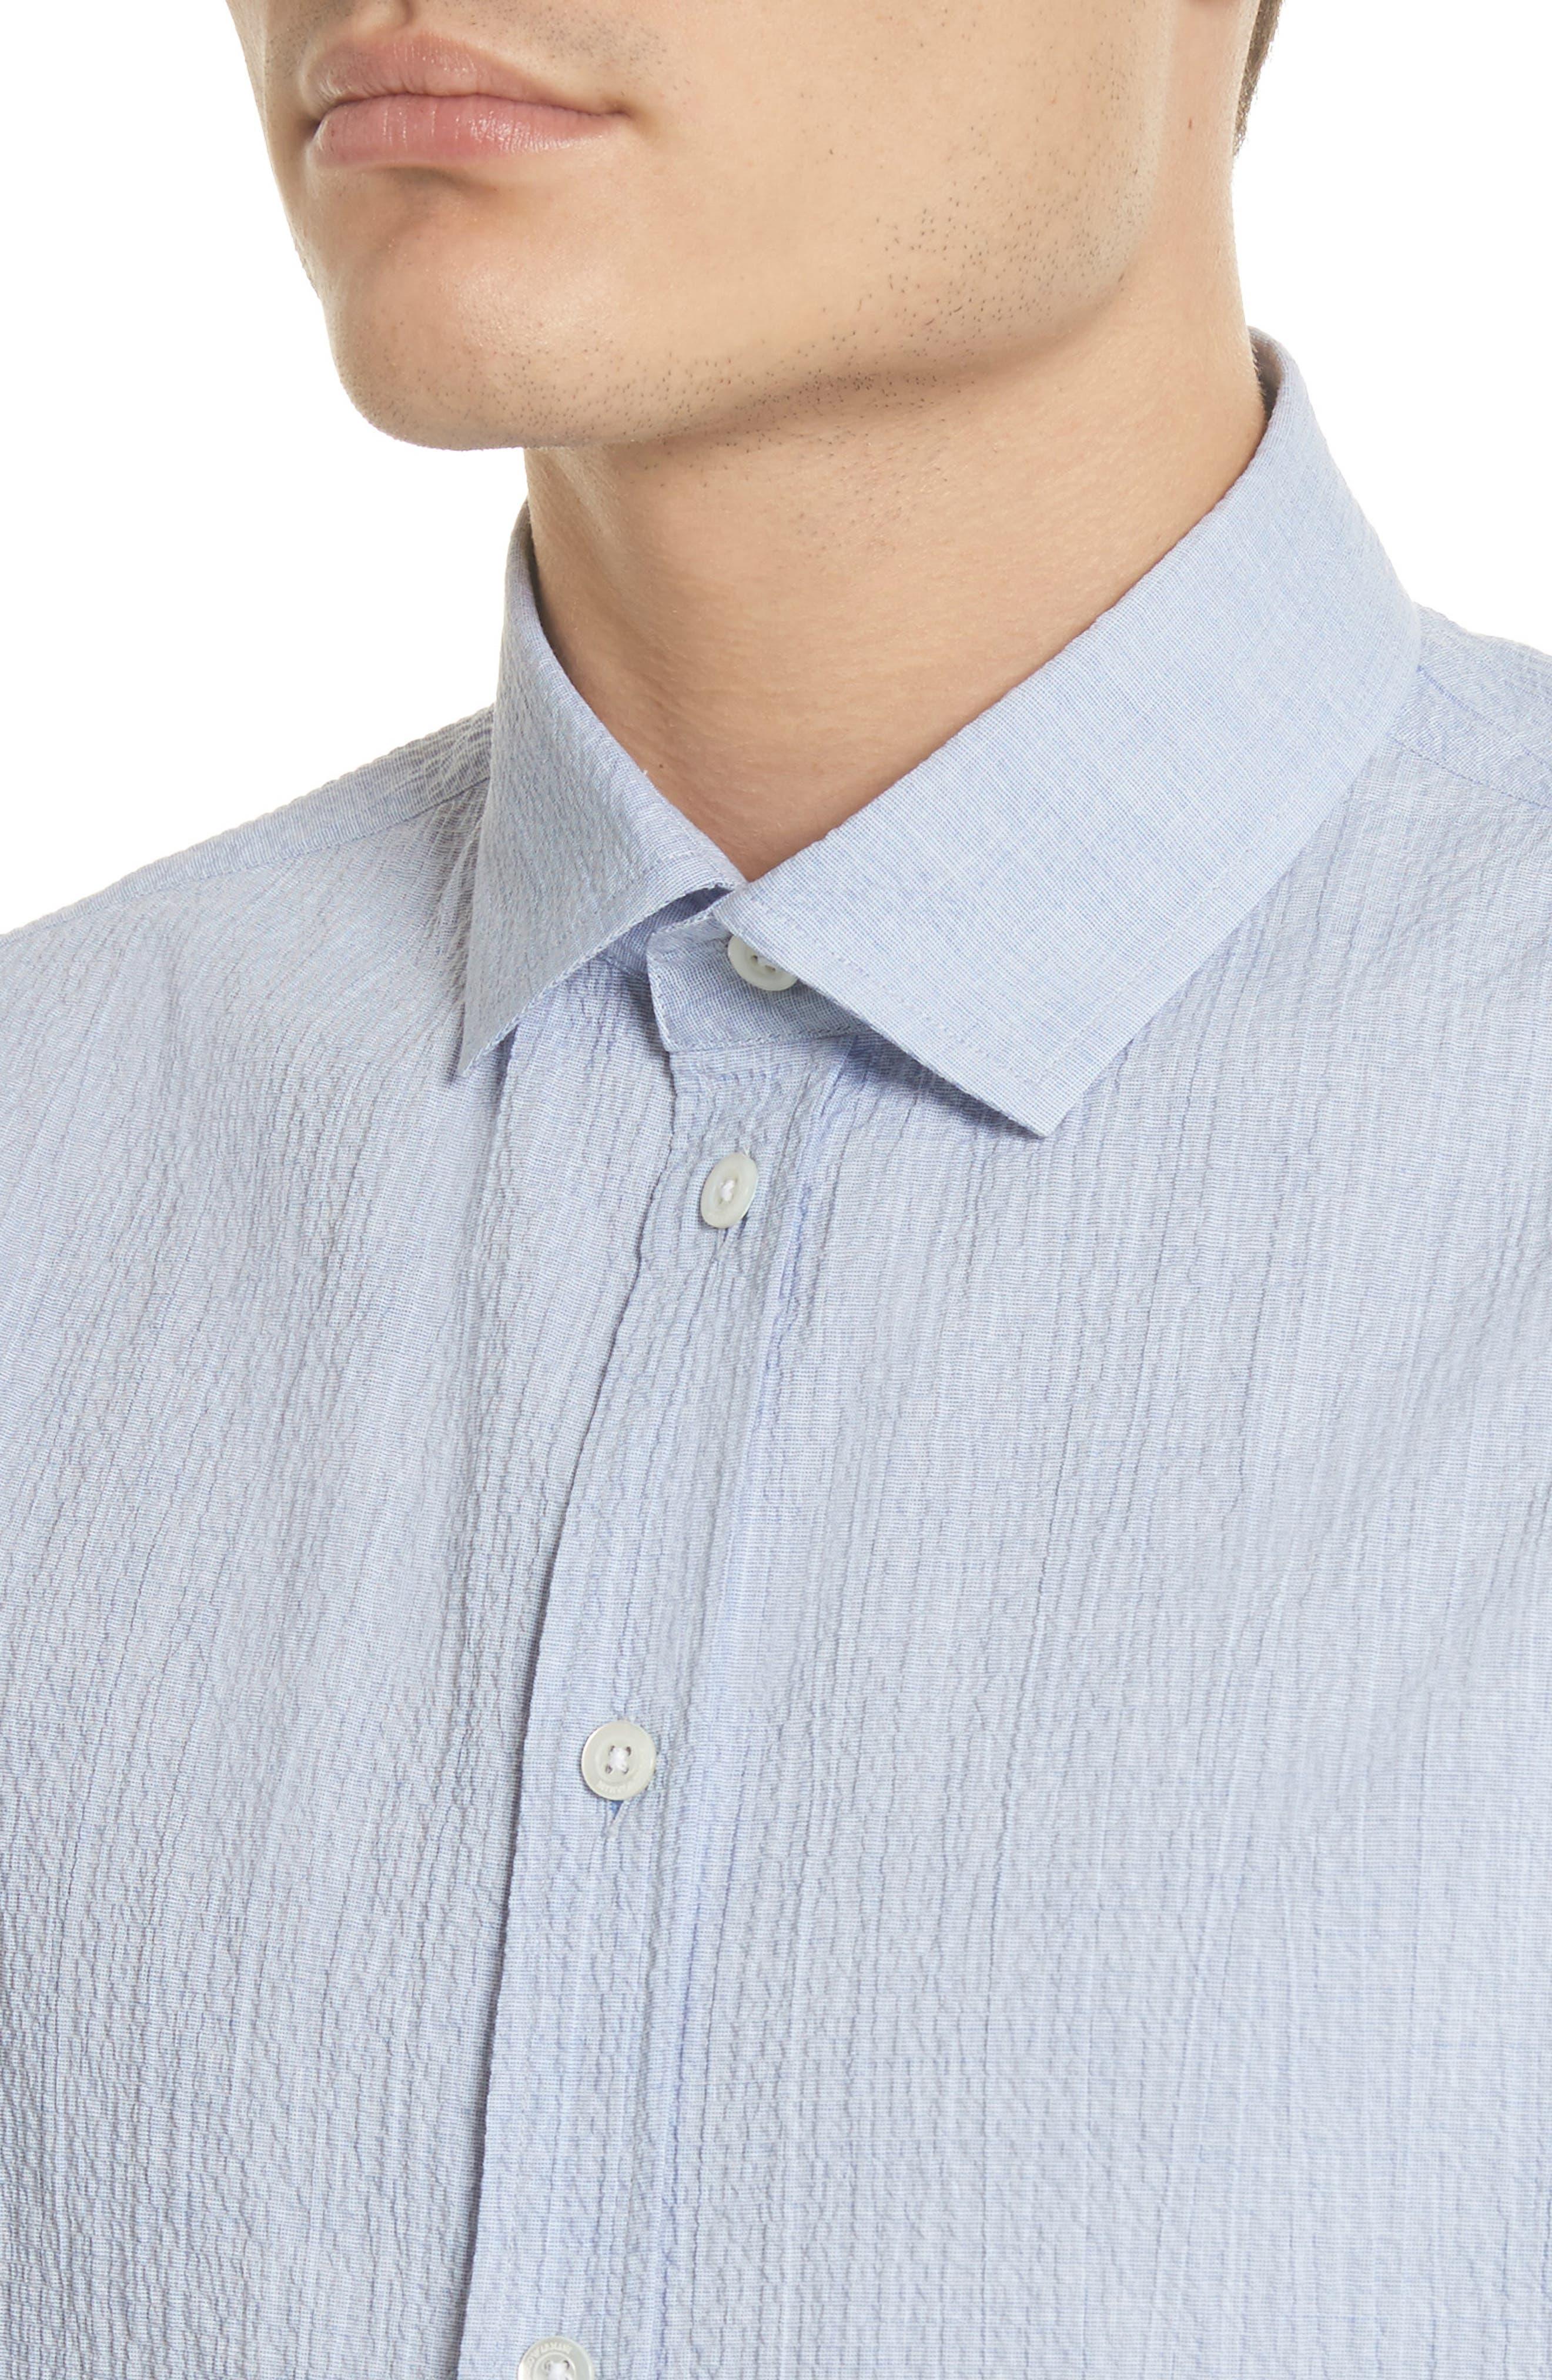 Regular Fit Seersucker Sport Shirt,                             Alternate thumbnail 2, color,                             Light Azure